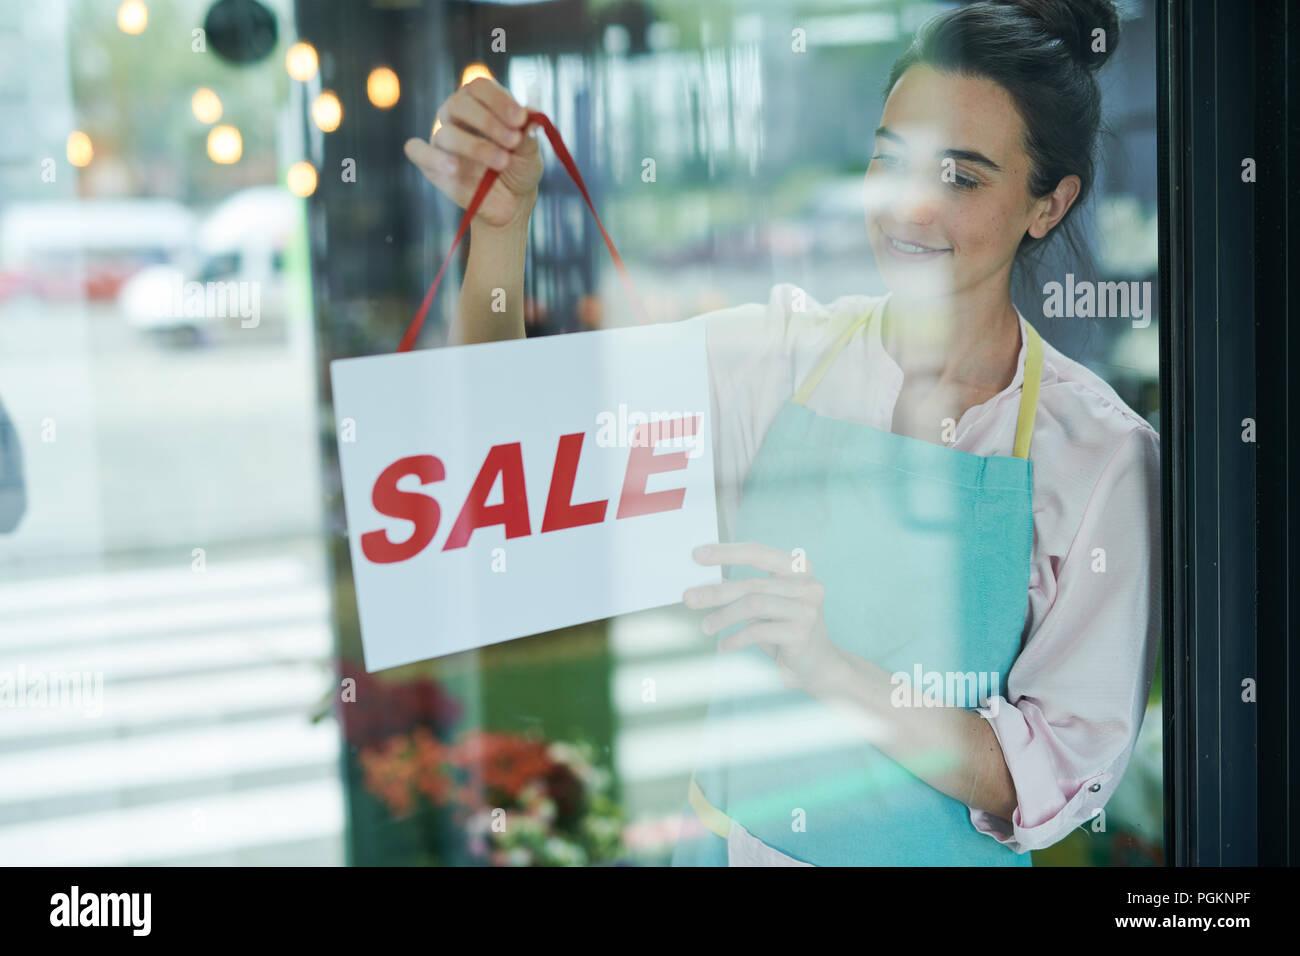 Waist up portrait of smiling female shopkeeper hanging SALE sign on door - Stock Image